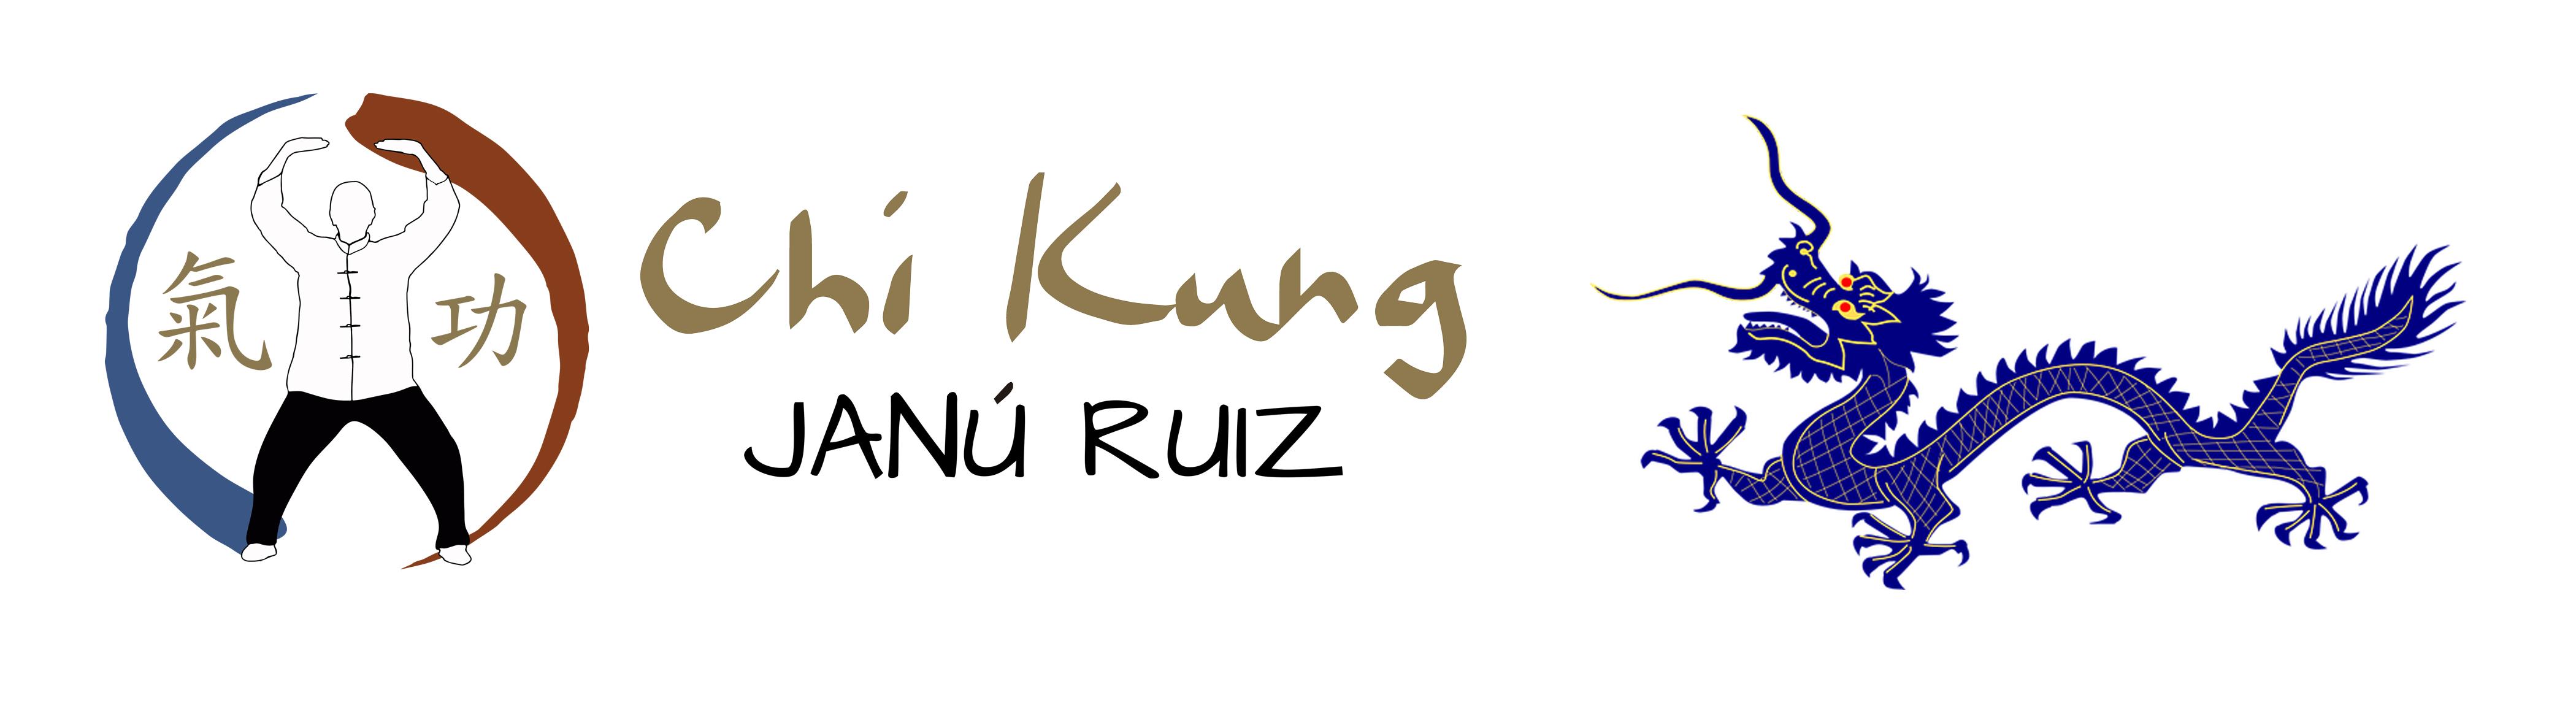 logo_janu